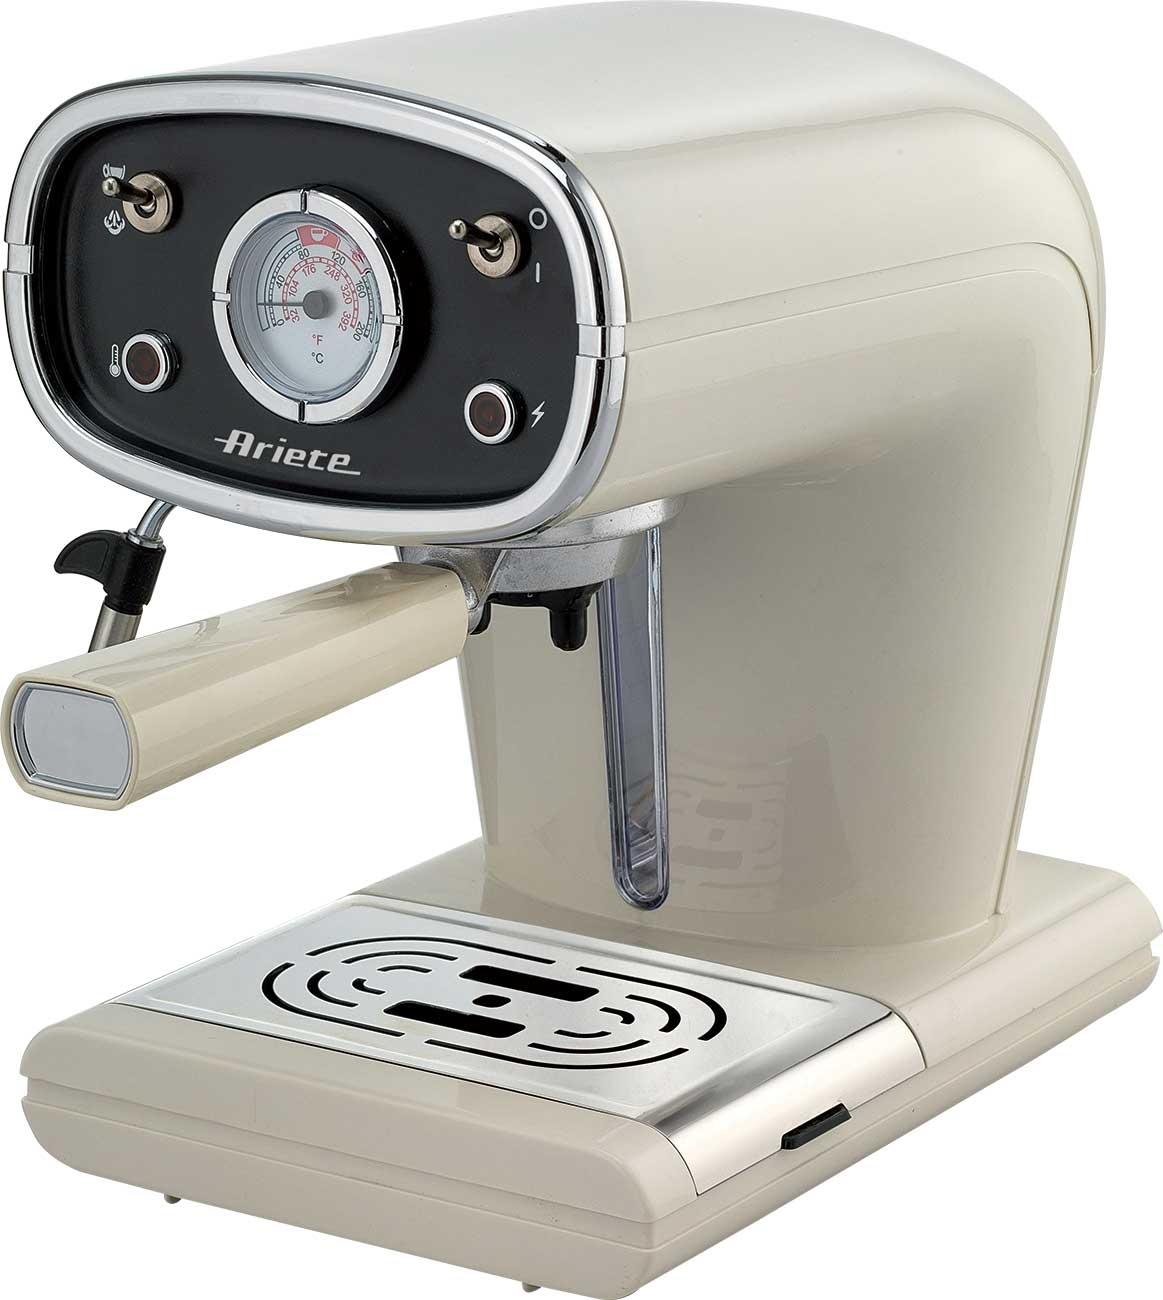 ARIES 1388 Coffee Machine Retro Vintage 850W Coffee Maker 15Bar   eBay